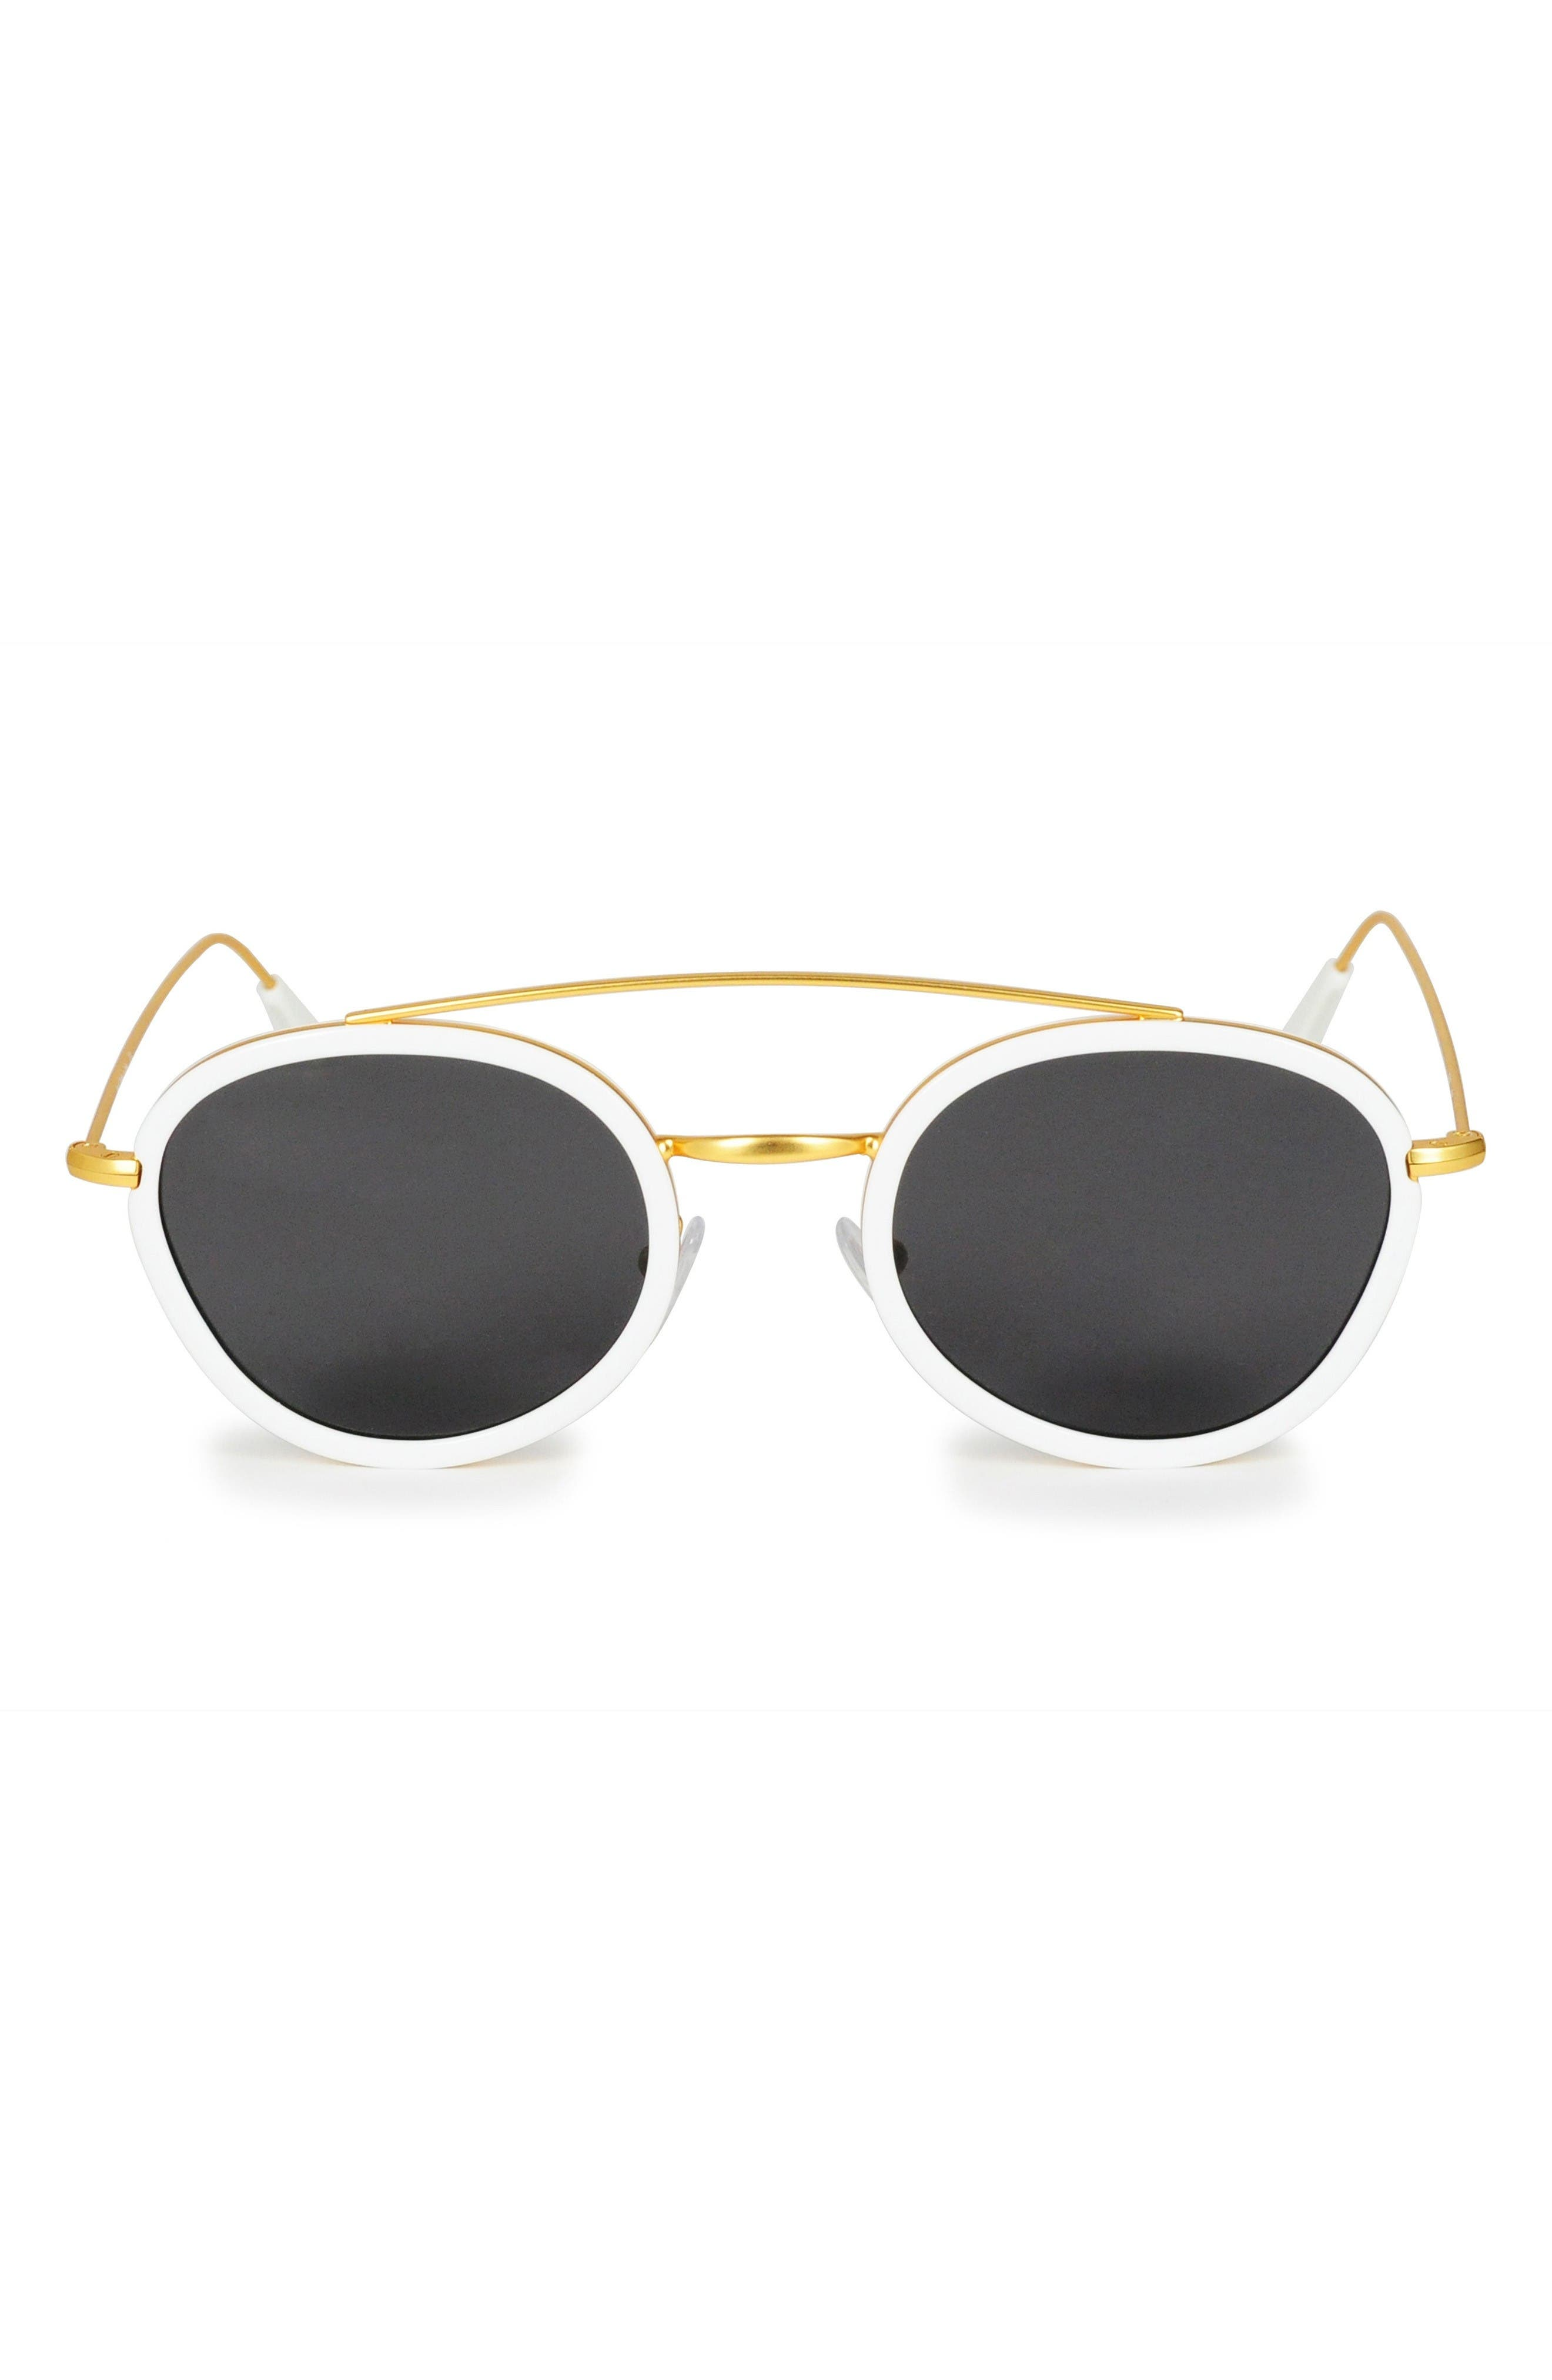 GLASSING Eddy 47mm Round Sunglasses